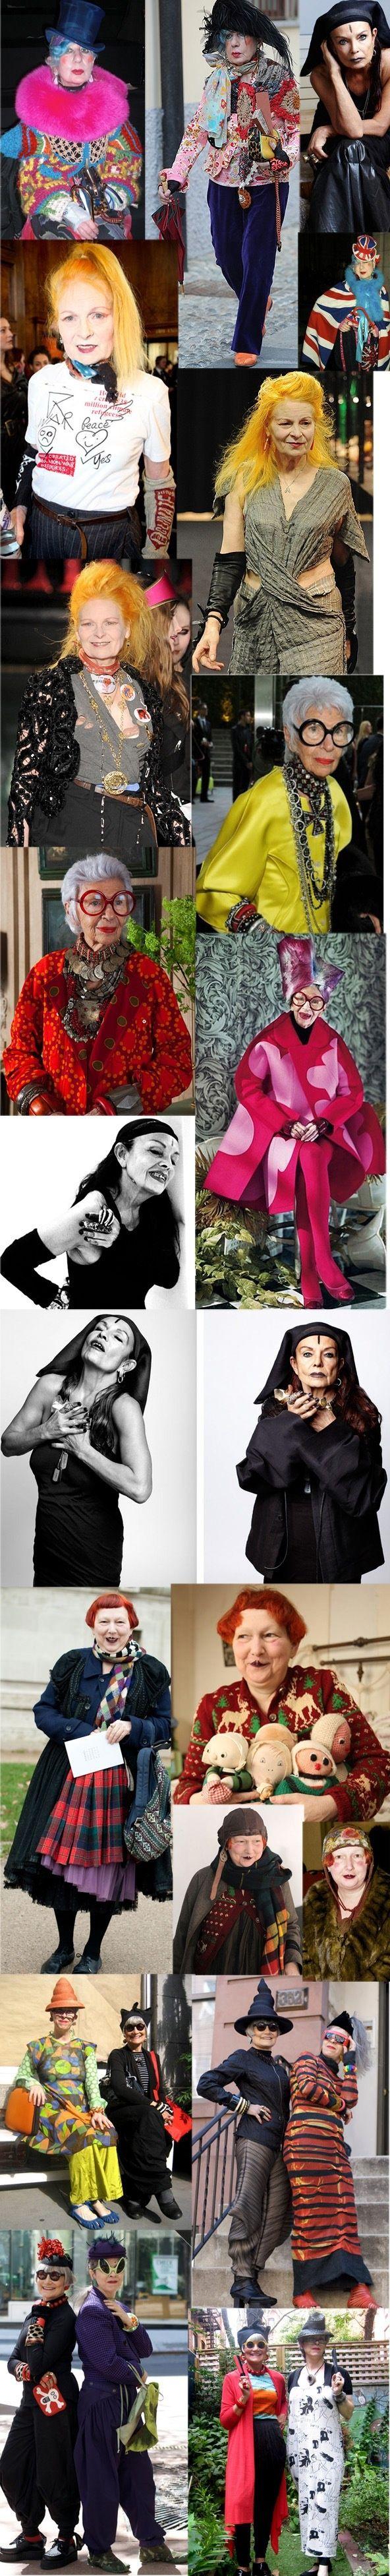 Fashion Over 50 Icons Mode über 50, Über 50 stil und Frau